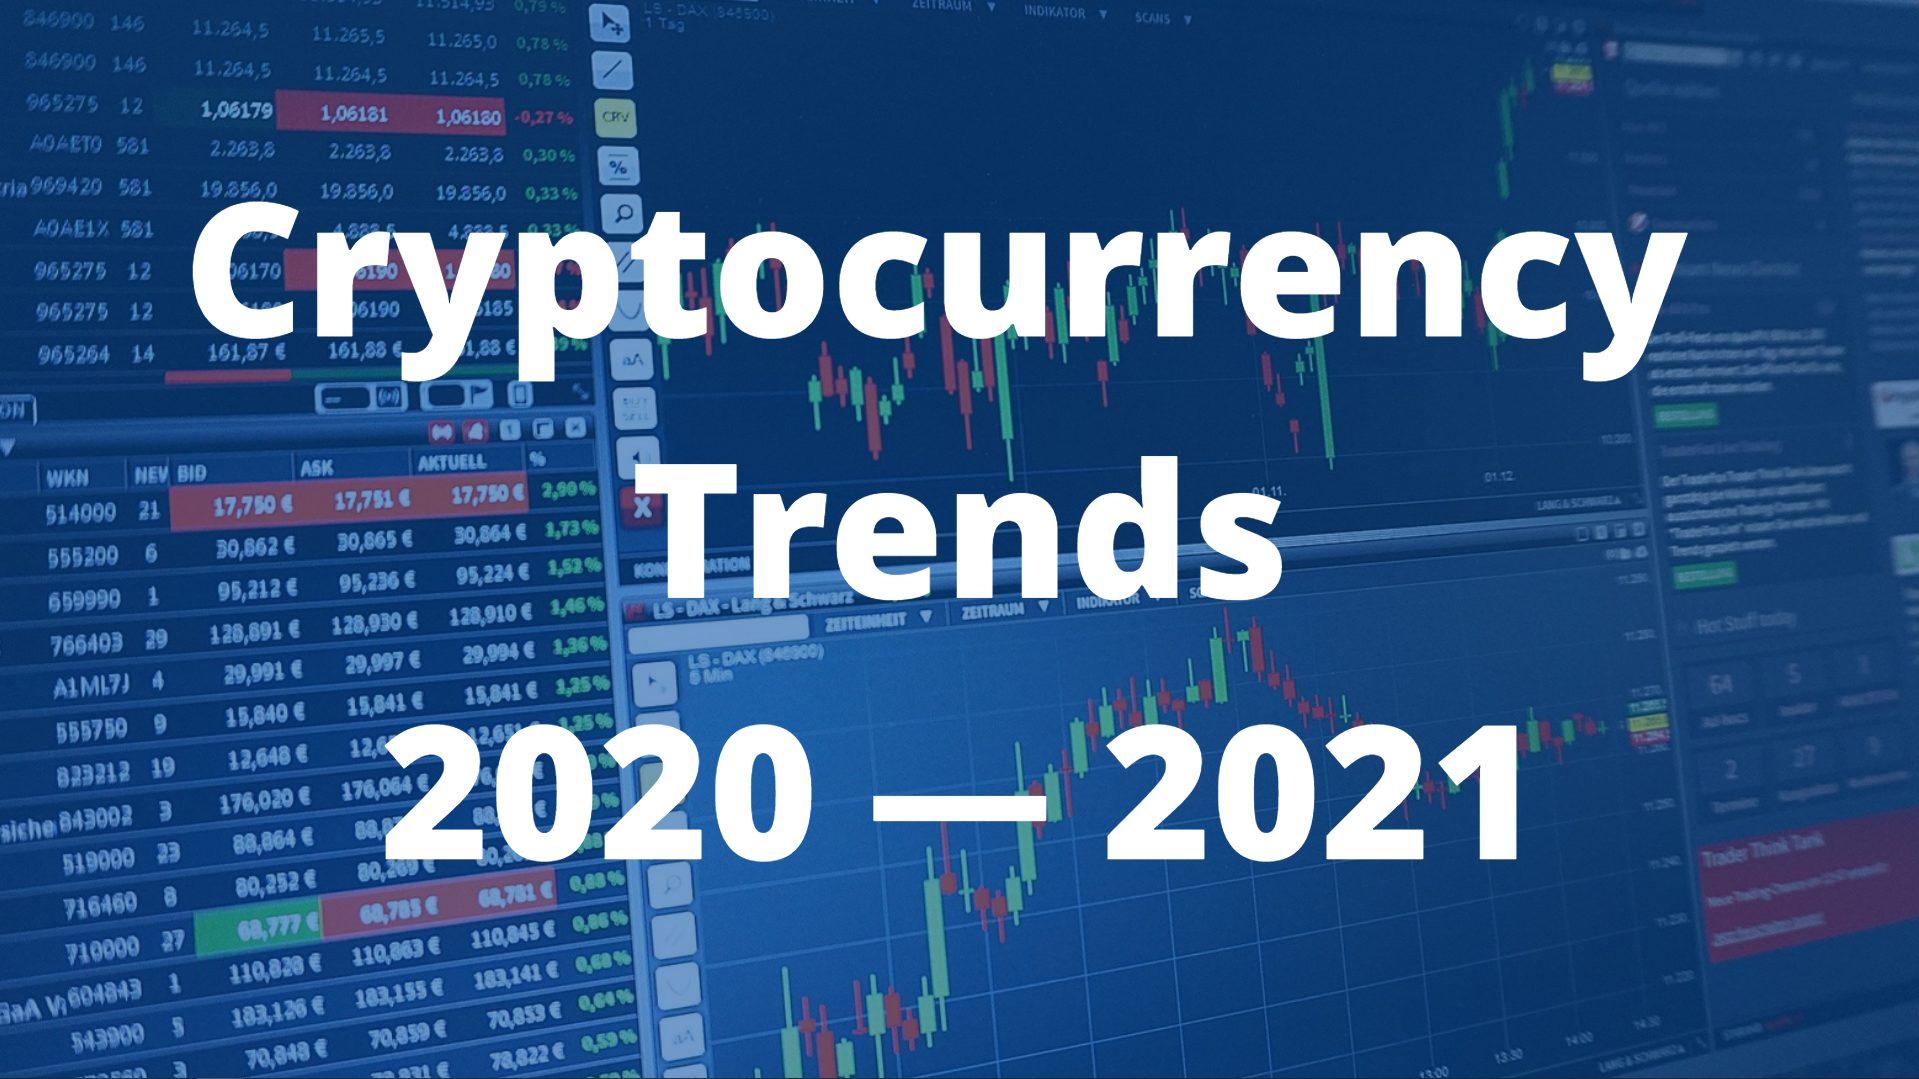 2021 m. forex perspektyvos